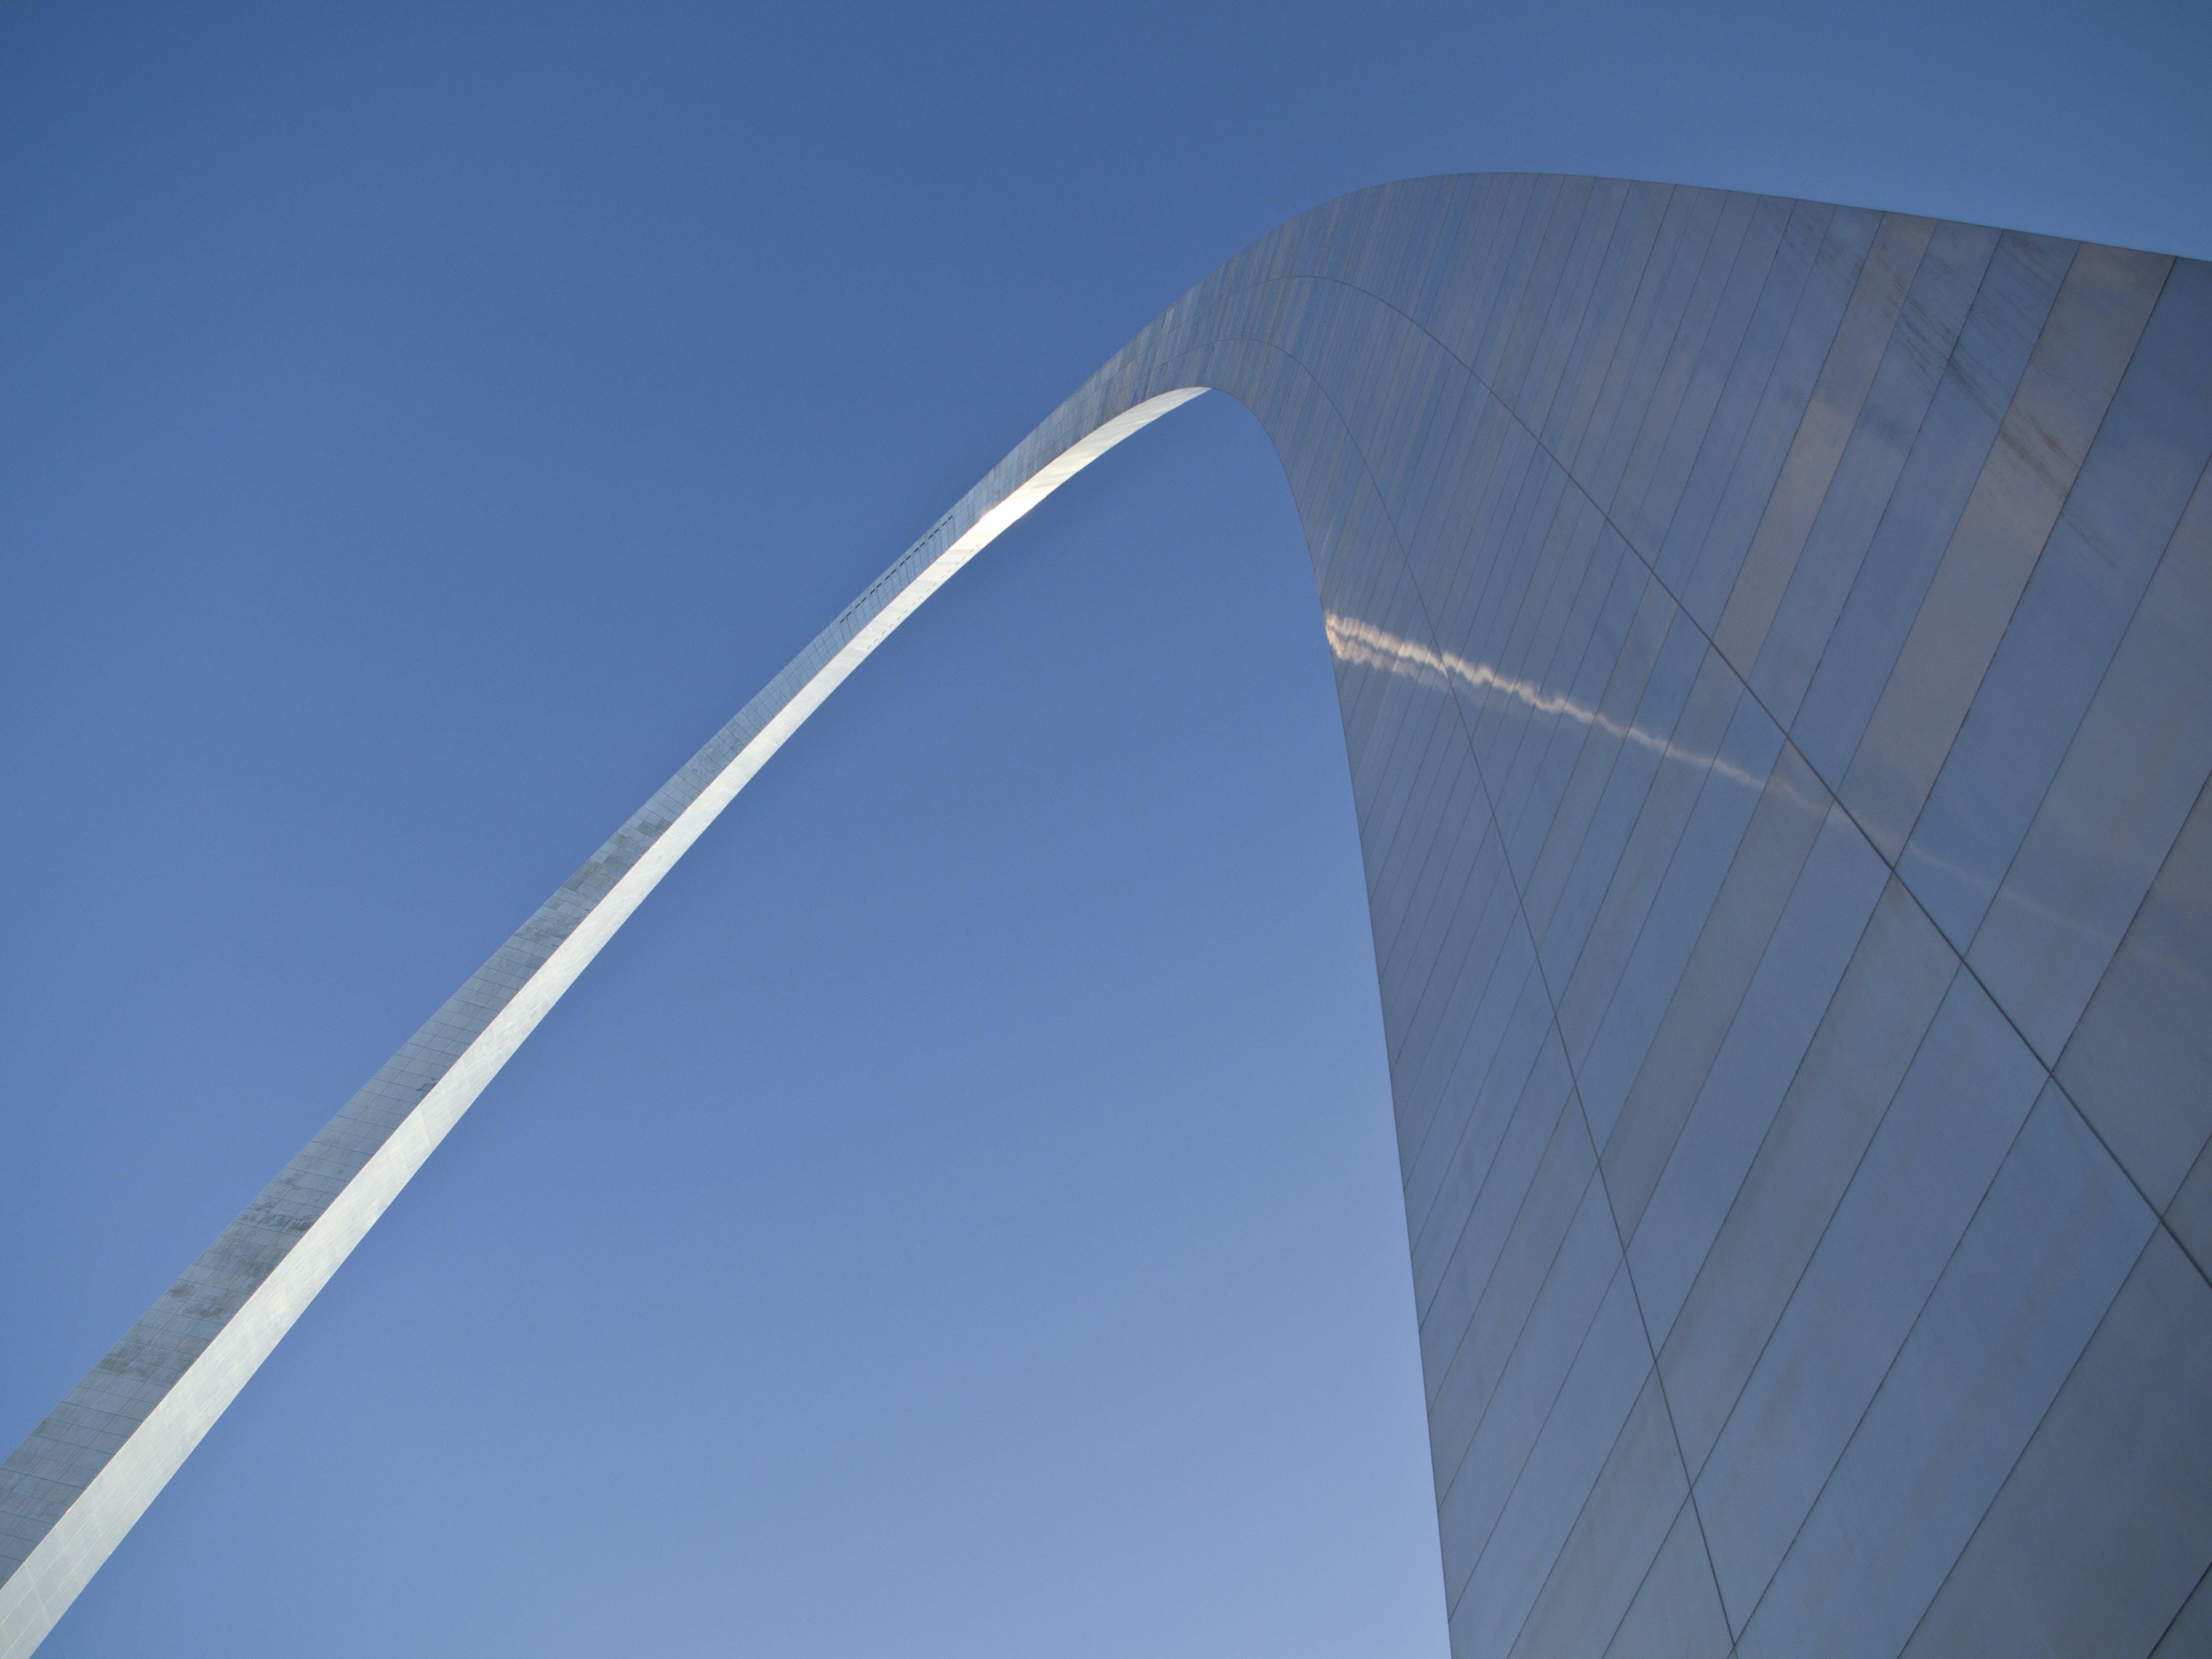 Grey Arc Building Under Blue Sky